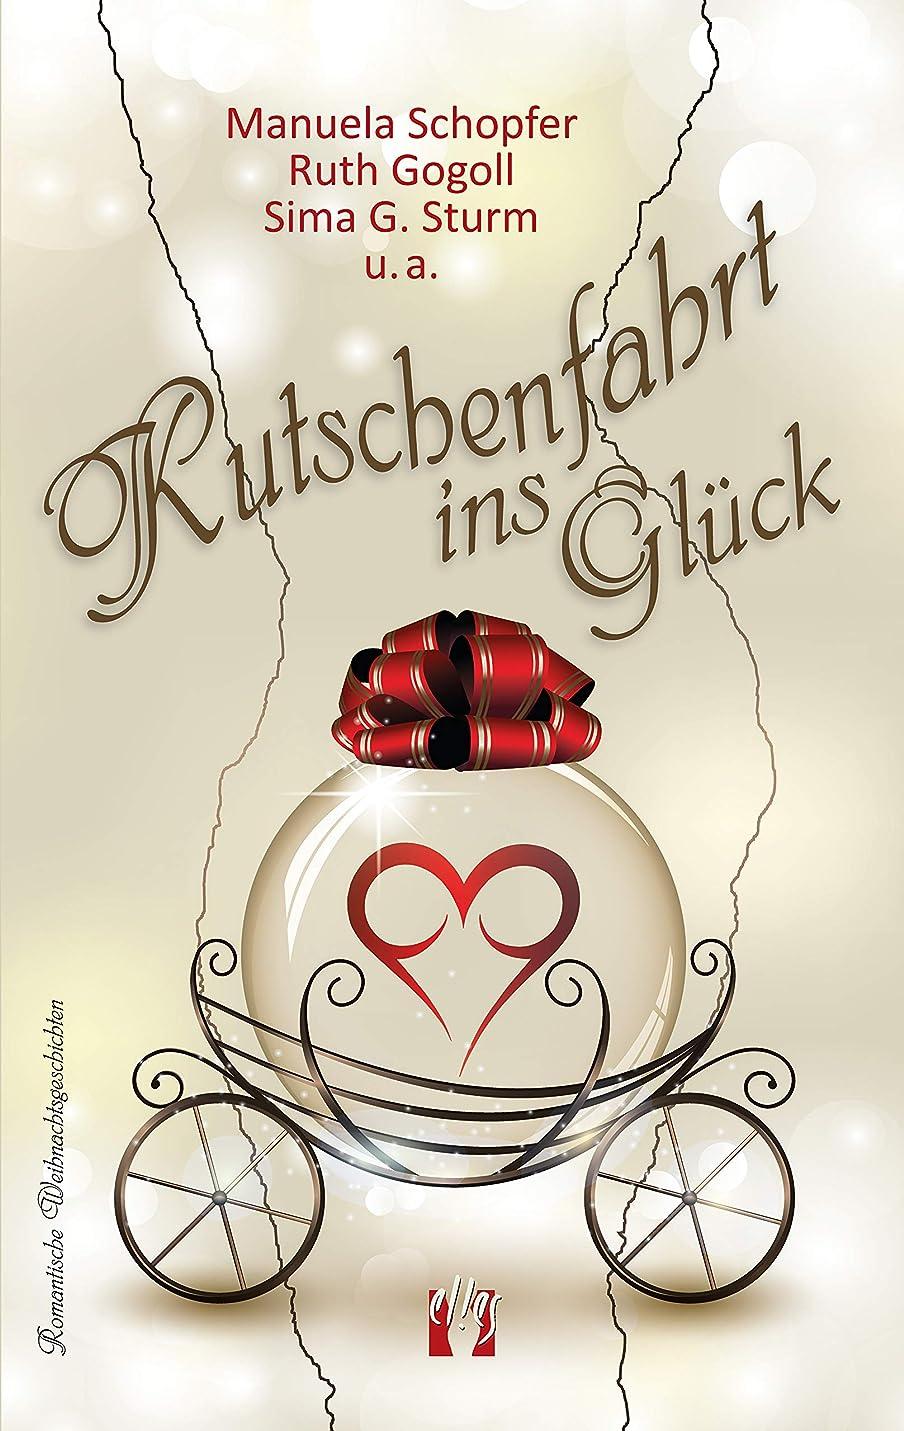 レース家畜適応Kutschenfahrt ins Glück: Romantische Weihnachtsgeschichten (German Edition)